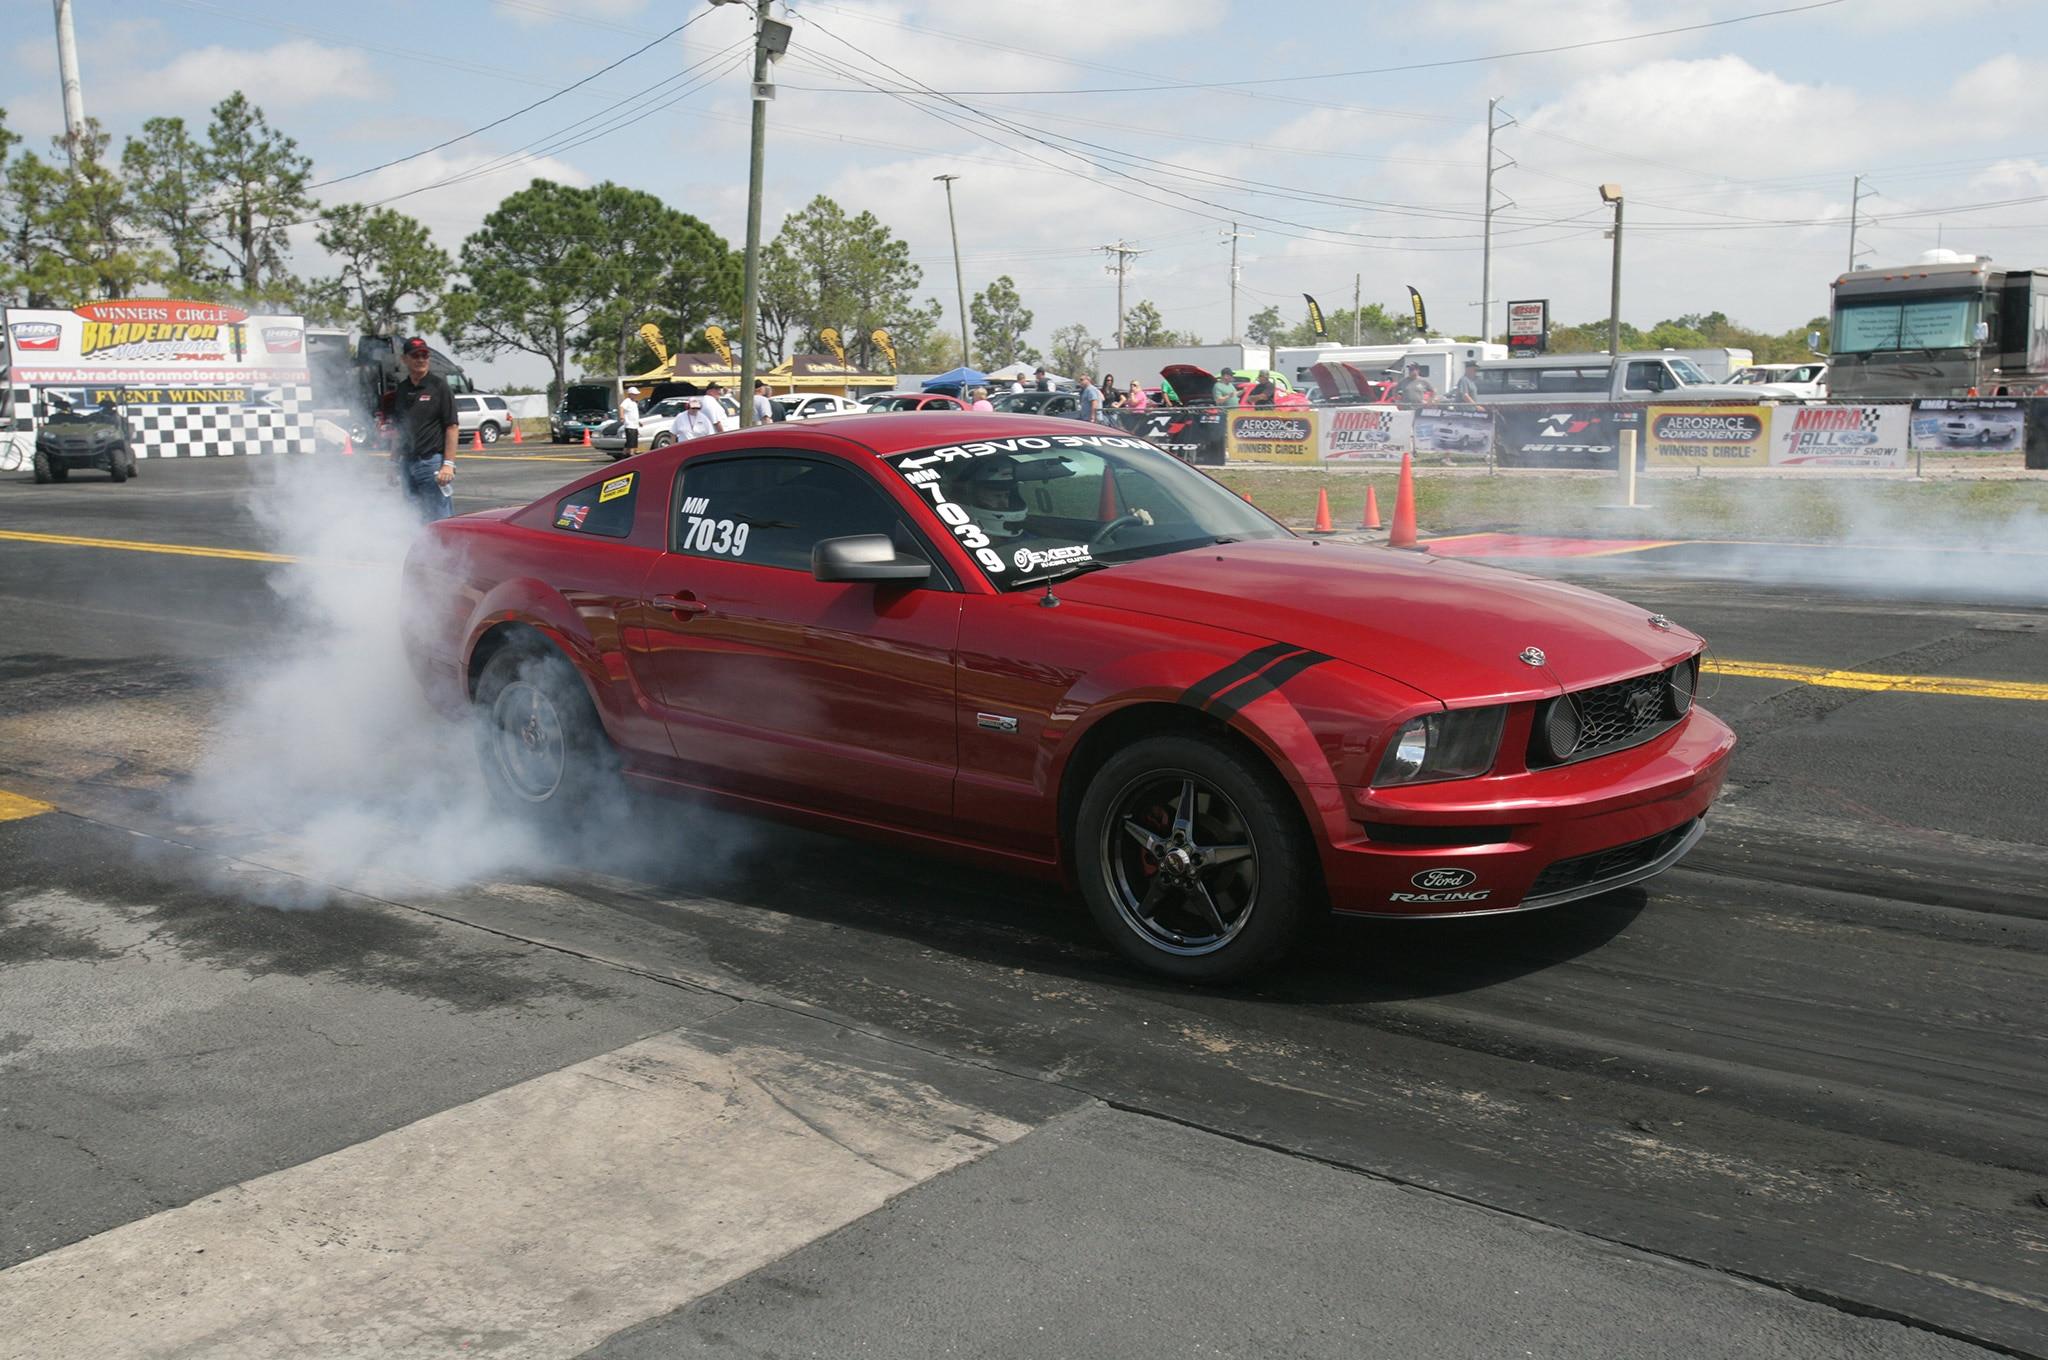 2015 Nmra Mustangs Burnout Red Black Stripes